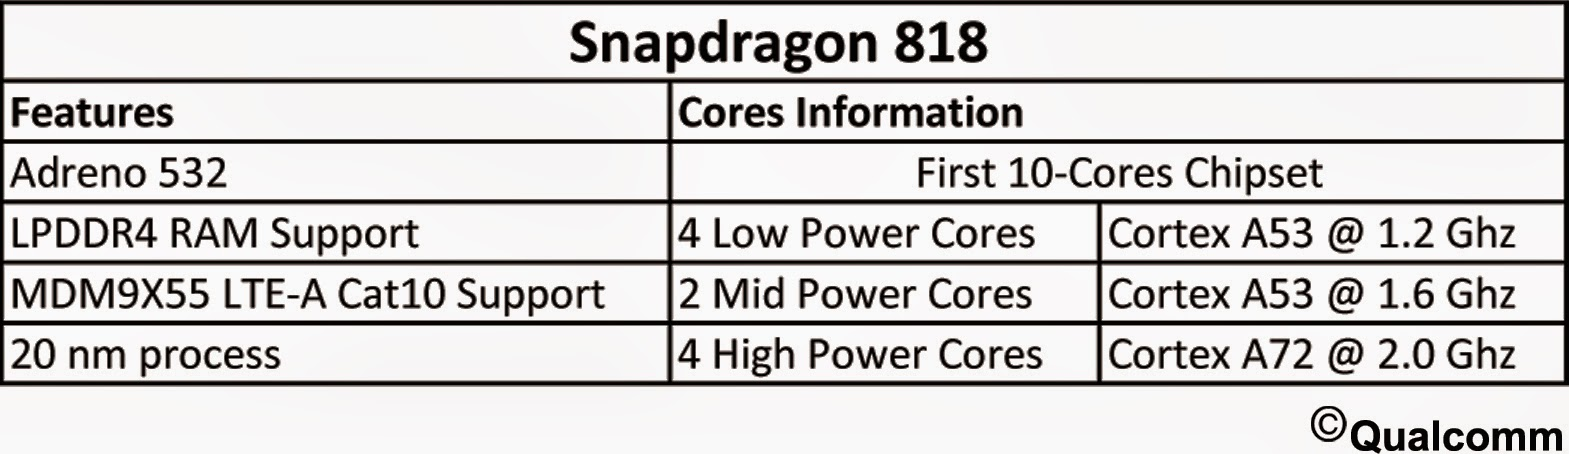 Qualcomm Snapdragon 818 !!?? 1